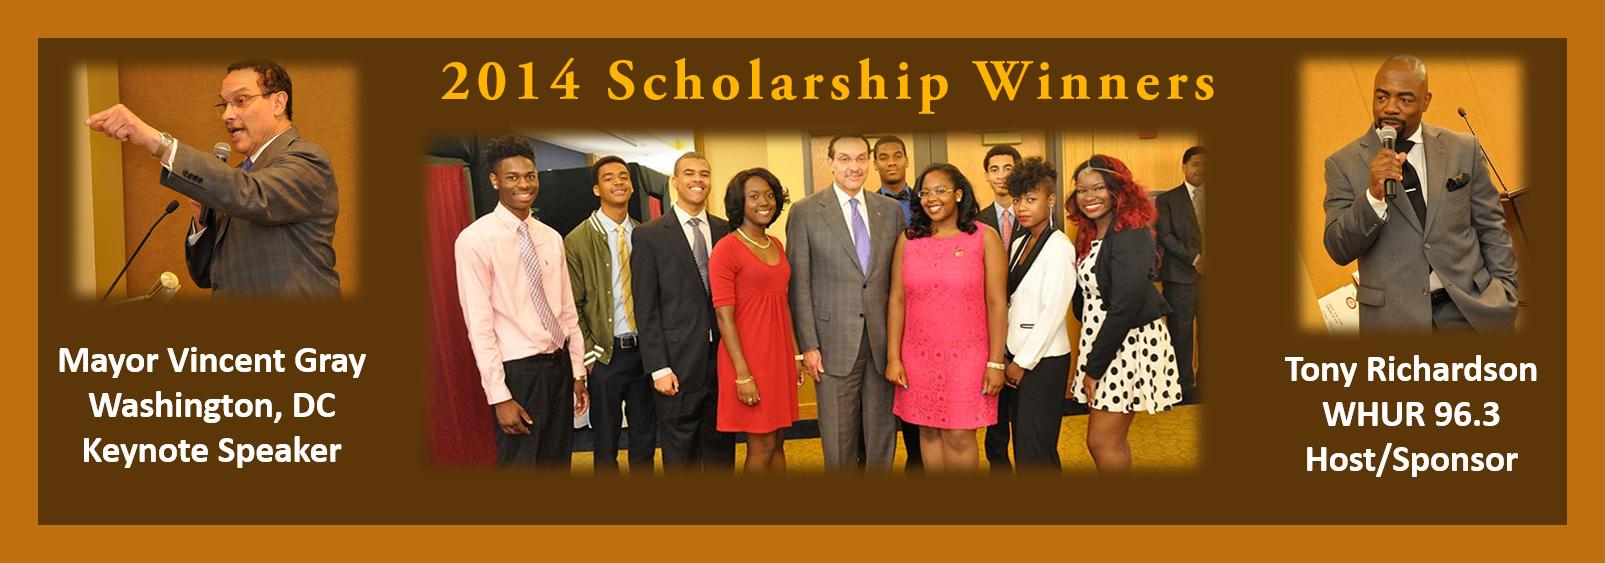 2014_Scholarship_Winners.png